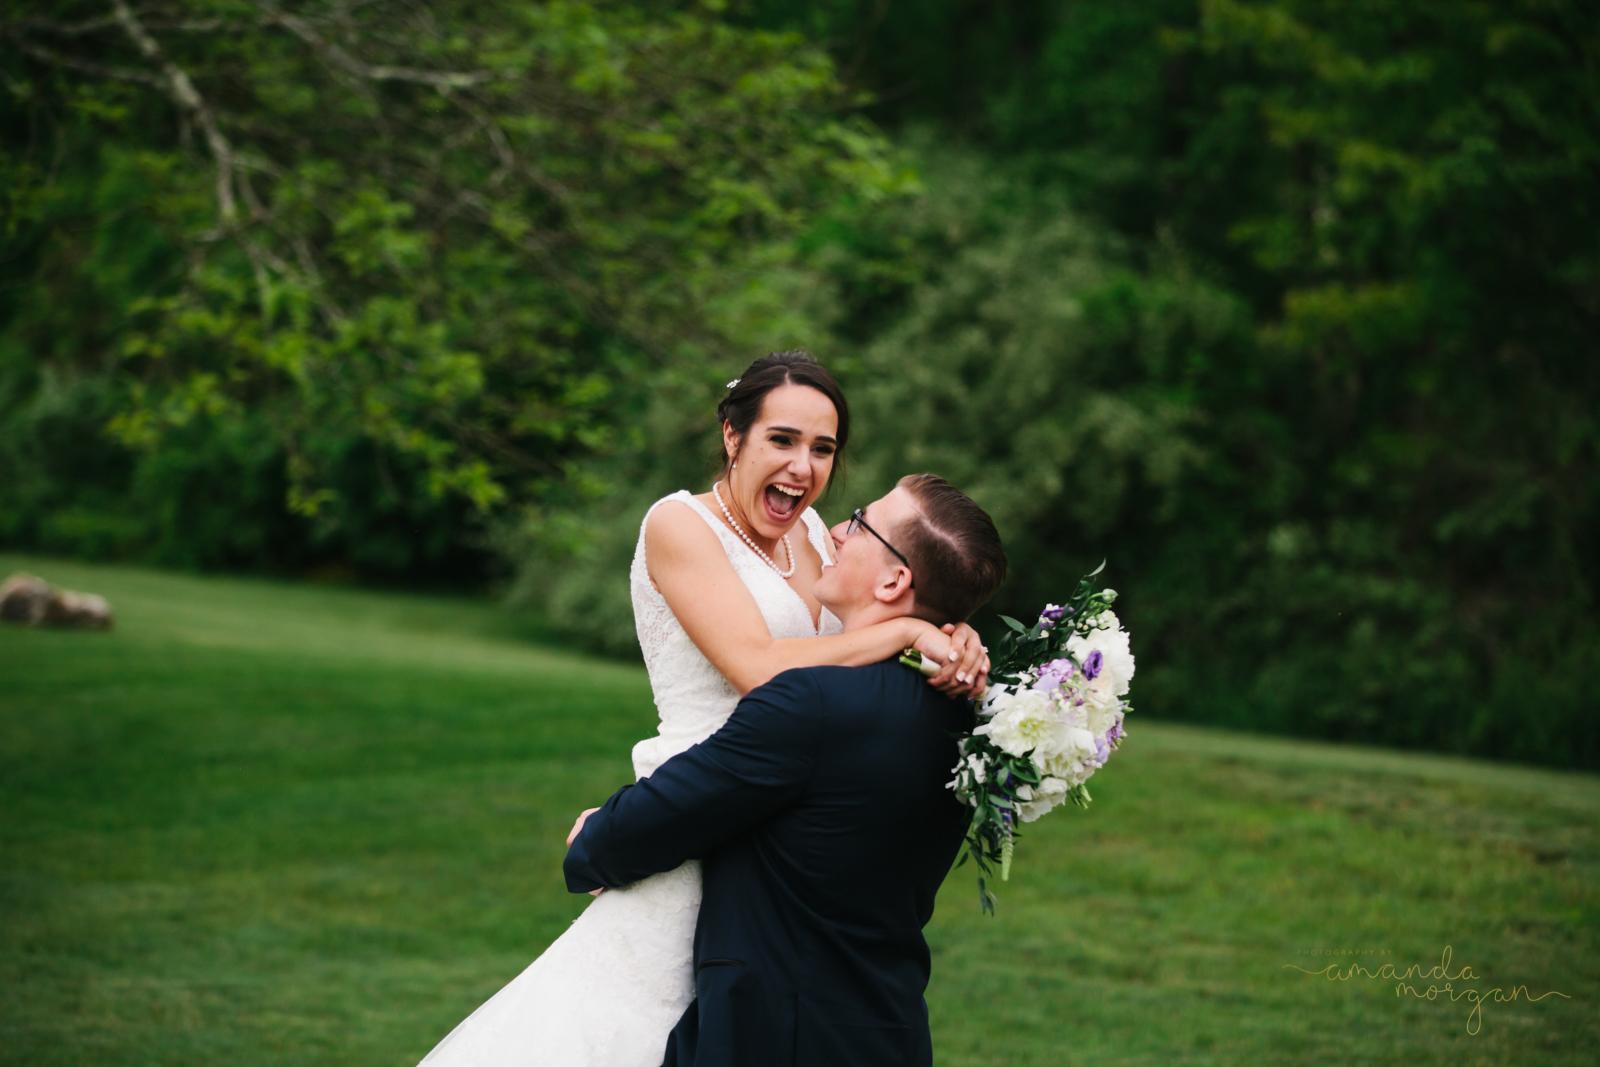 Publick-House-Wedding-Amanda-Morgan-36.jpg